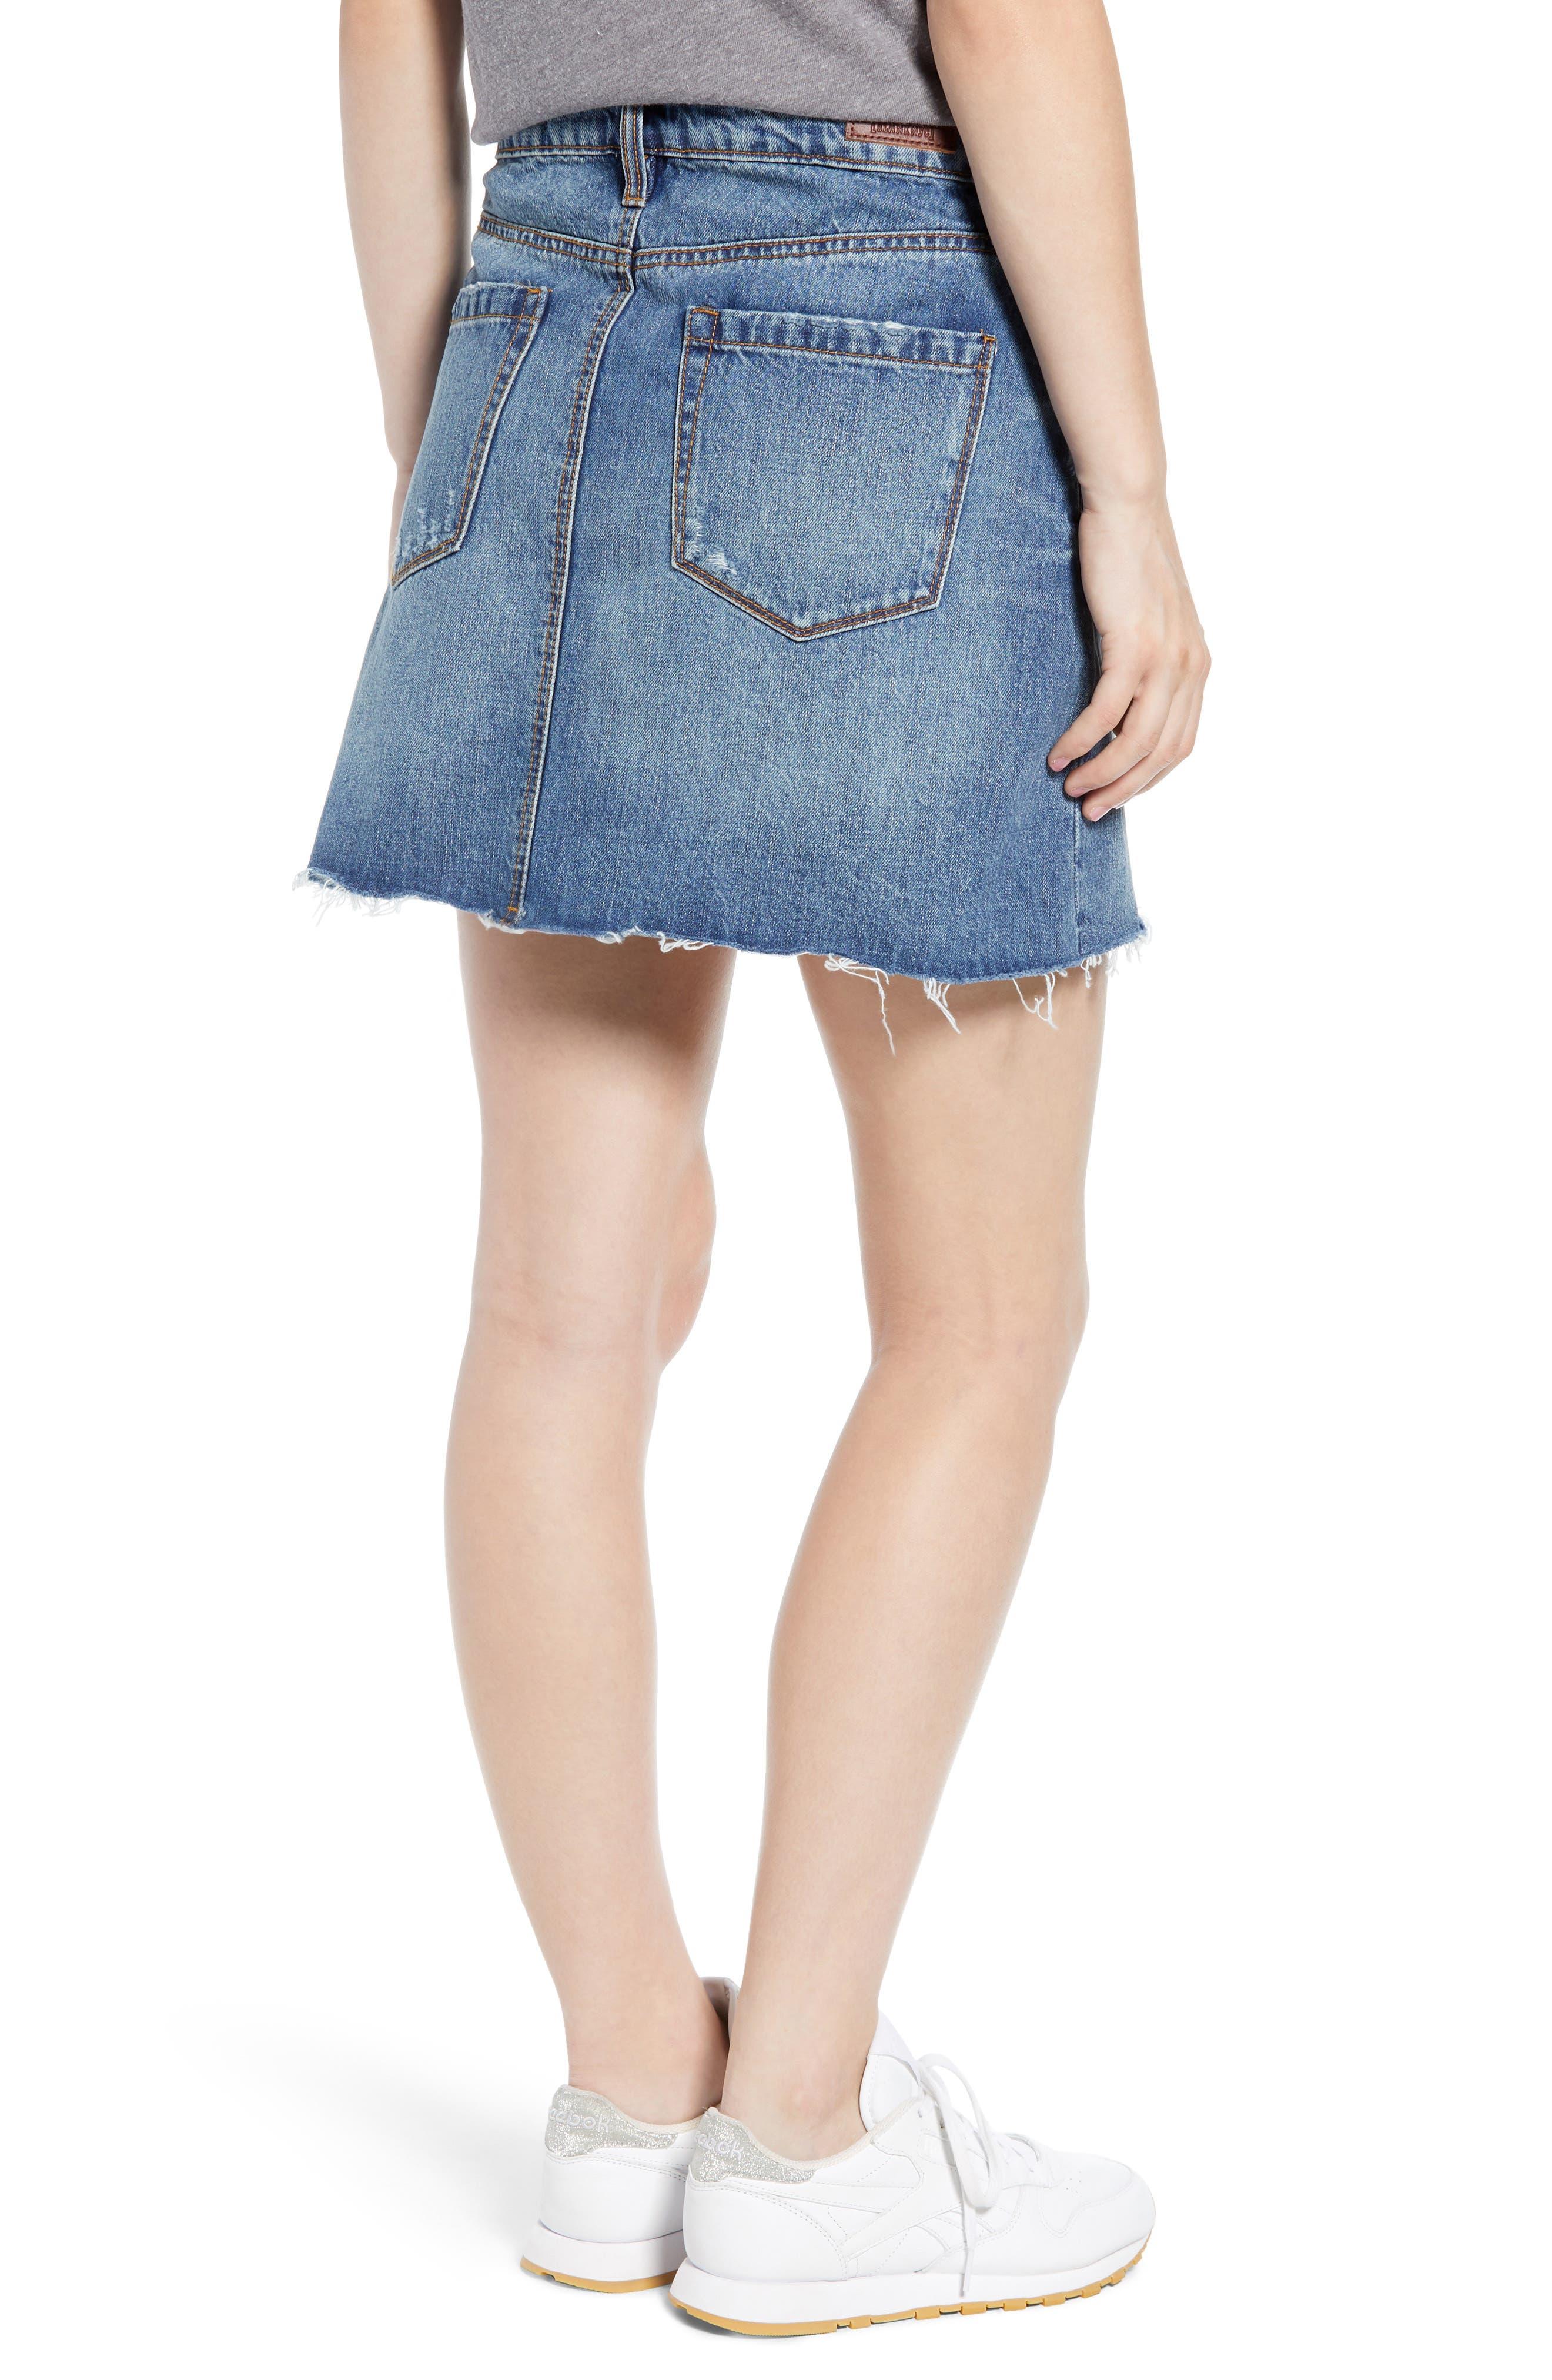 BLANKNYC, Way Back When Cutoff Denim Skirt, Alternate thumbnail 2, color, 400